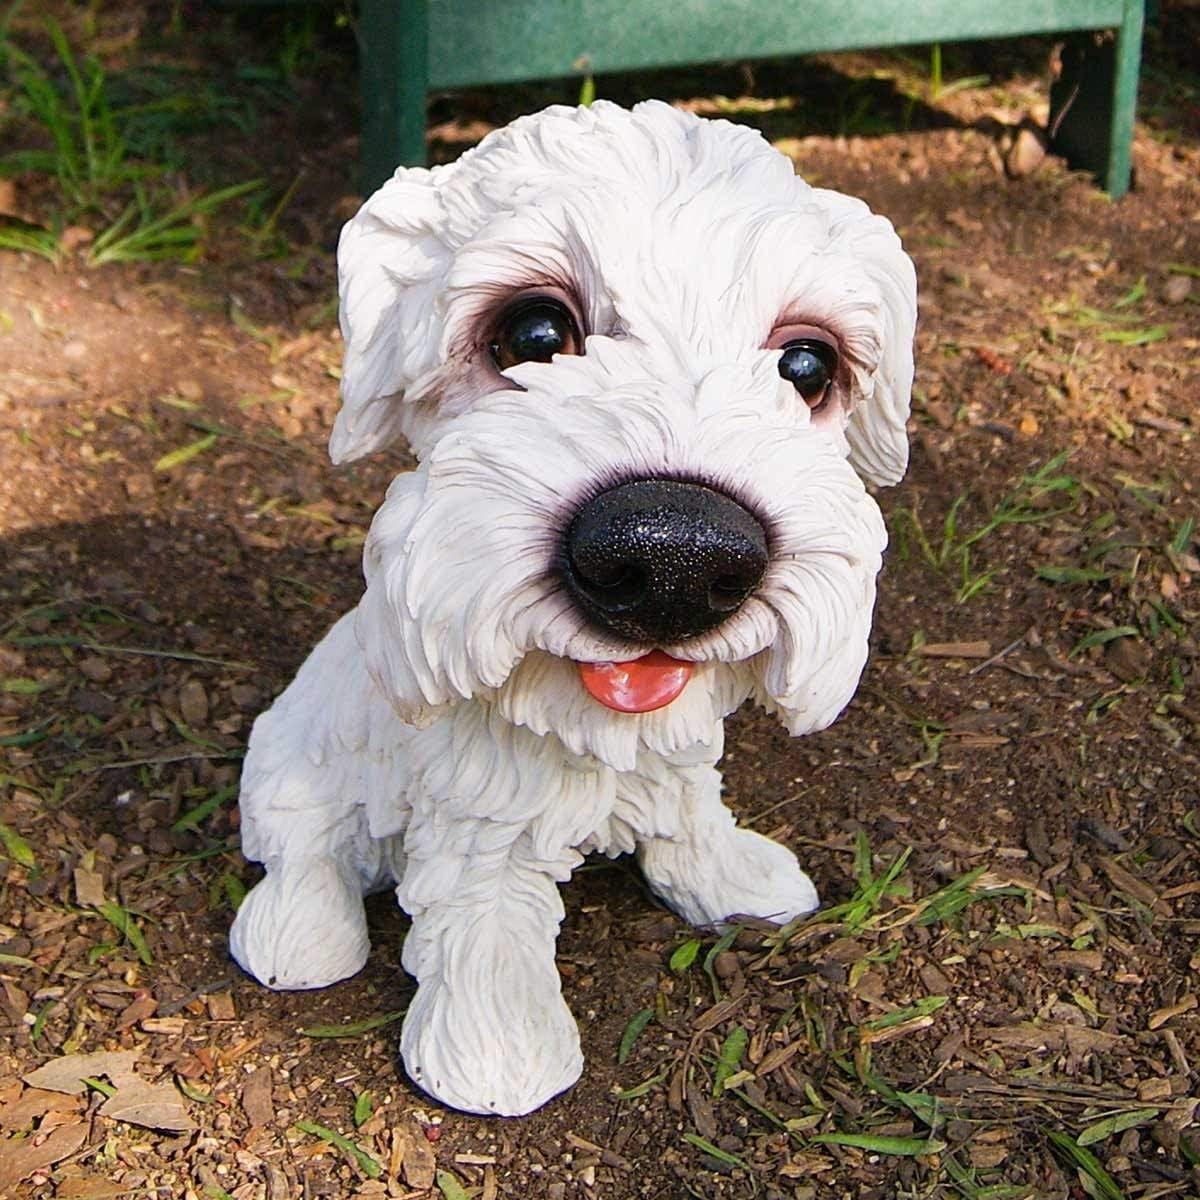 Alpine Corporation White Puppy with Big Head 1 year warranty Inch 14 Super intense SALE Tal Statue